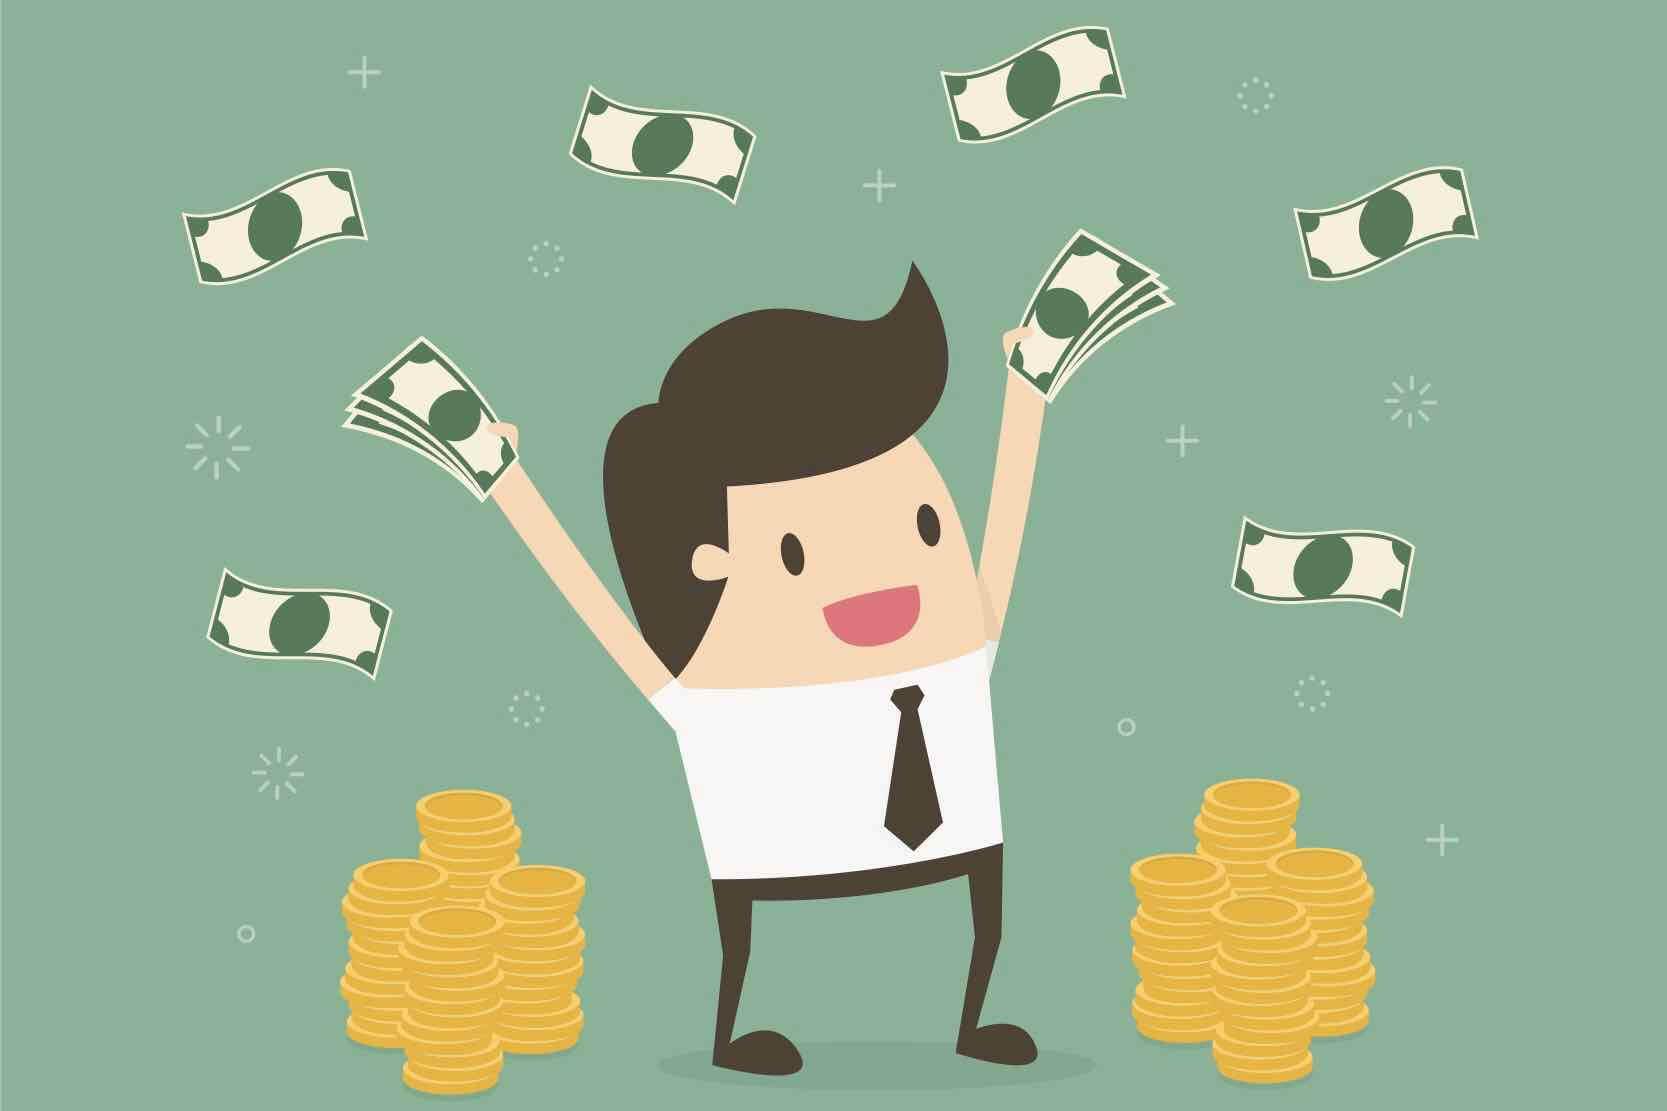 No Money Cartoon - Cliparts.co |More Money Cartoon